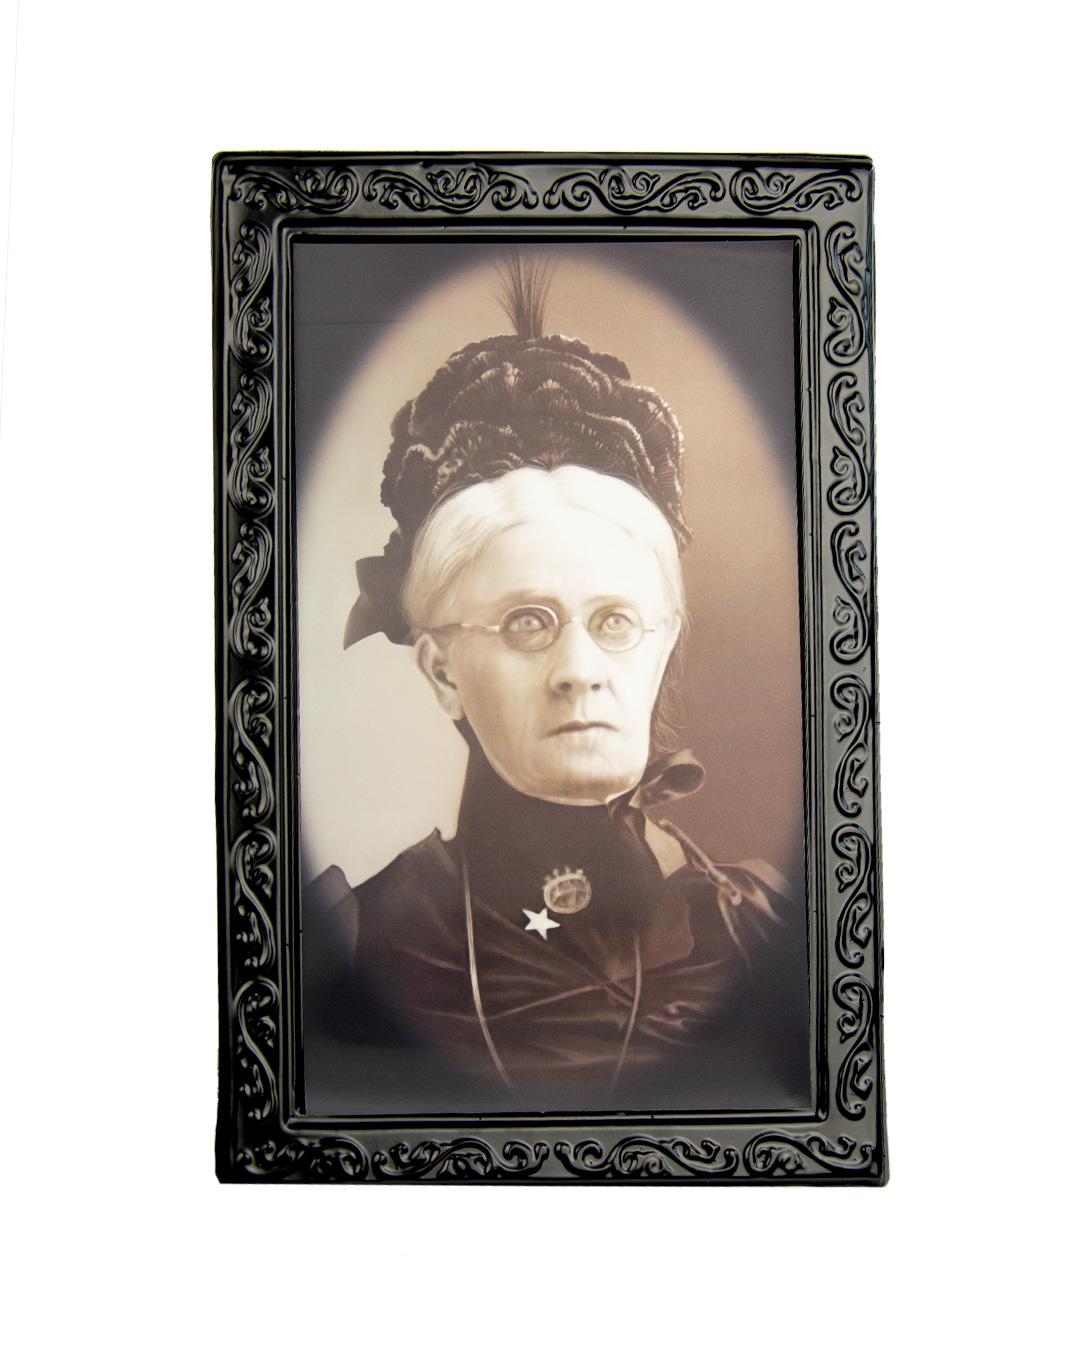 Großes Hologramm Bild - böse Tante -  Halloween Portrait Bild